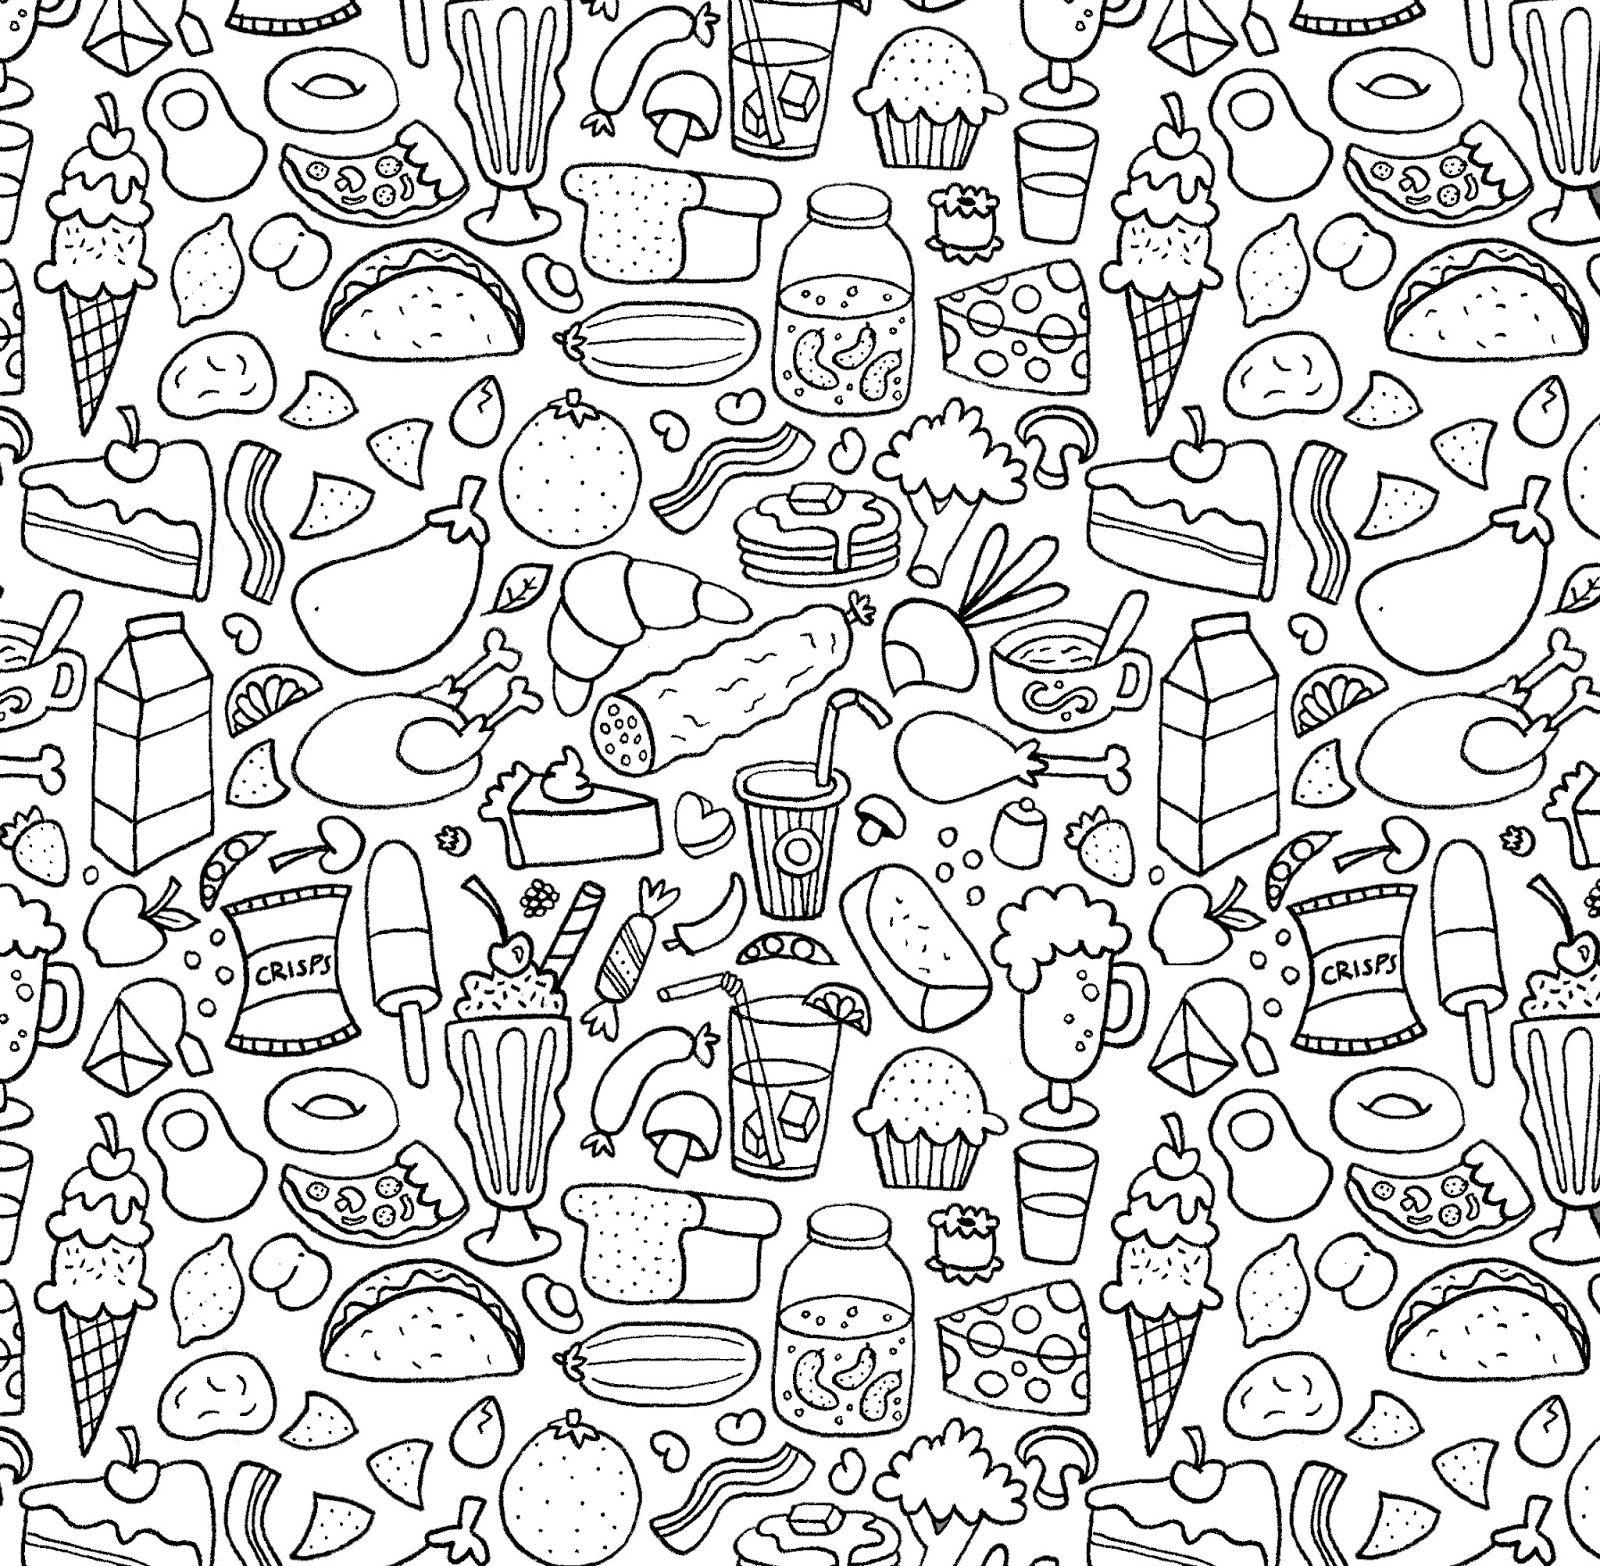 Pin by 晨耘 洪 on Art   Doodle patterns, Doodle images, Doodles